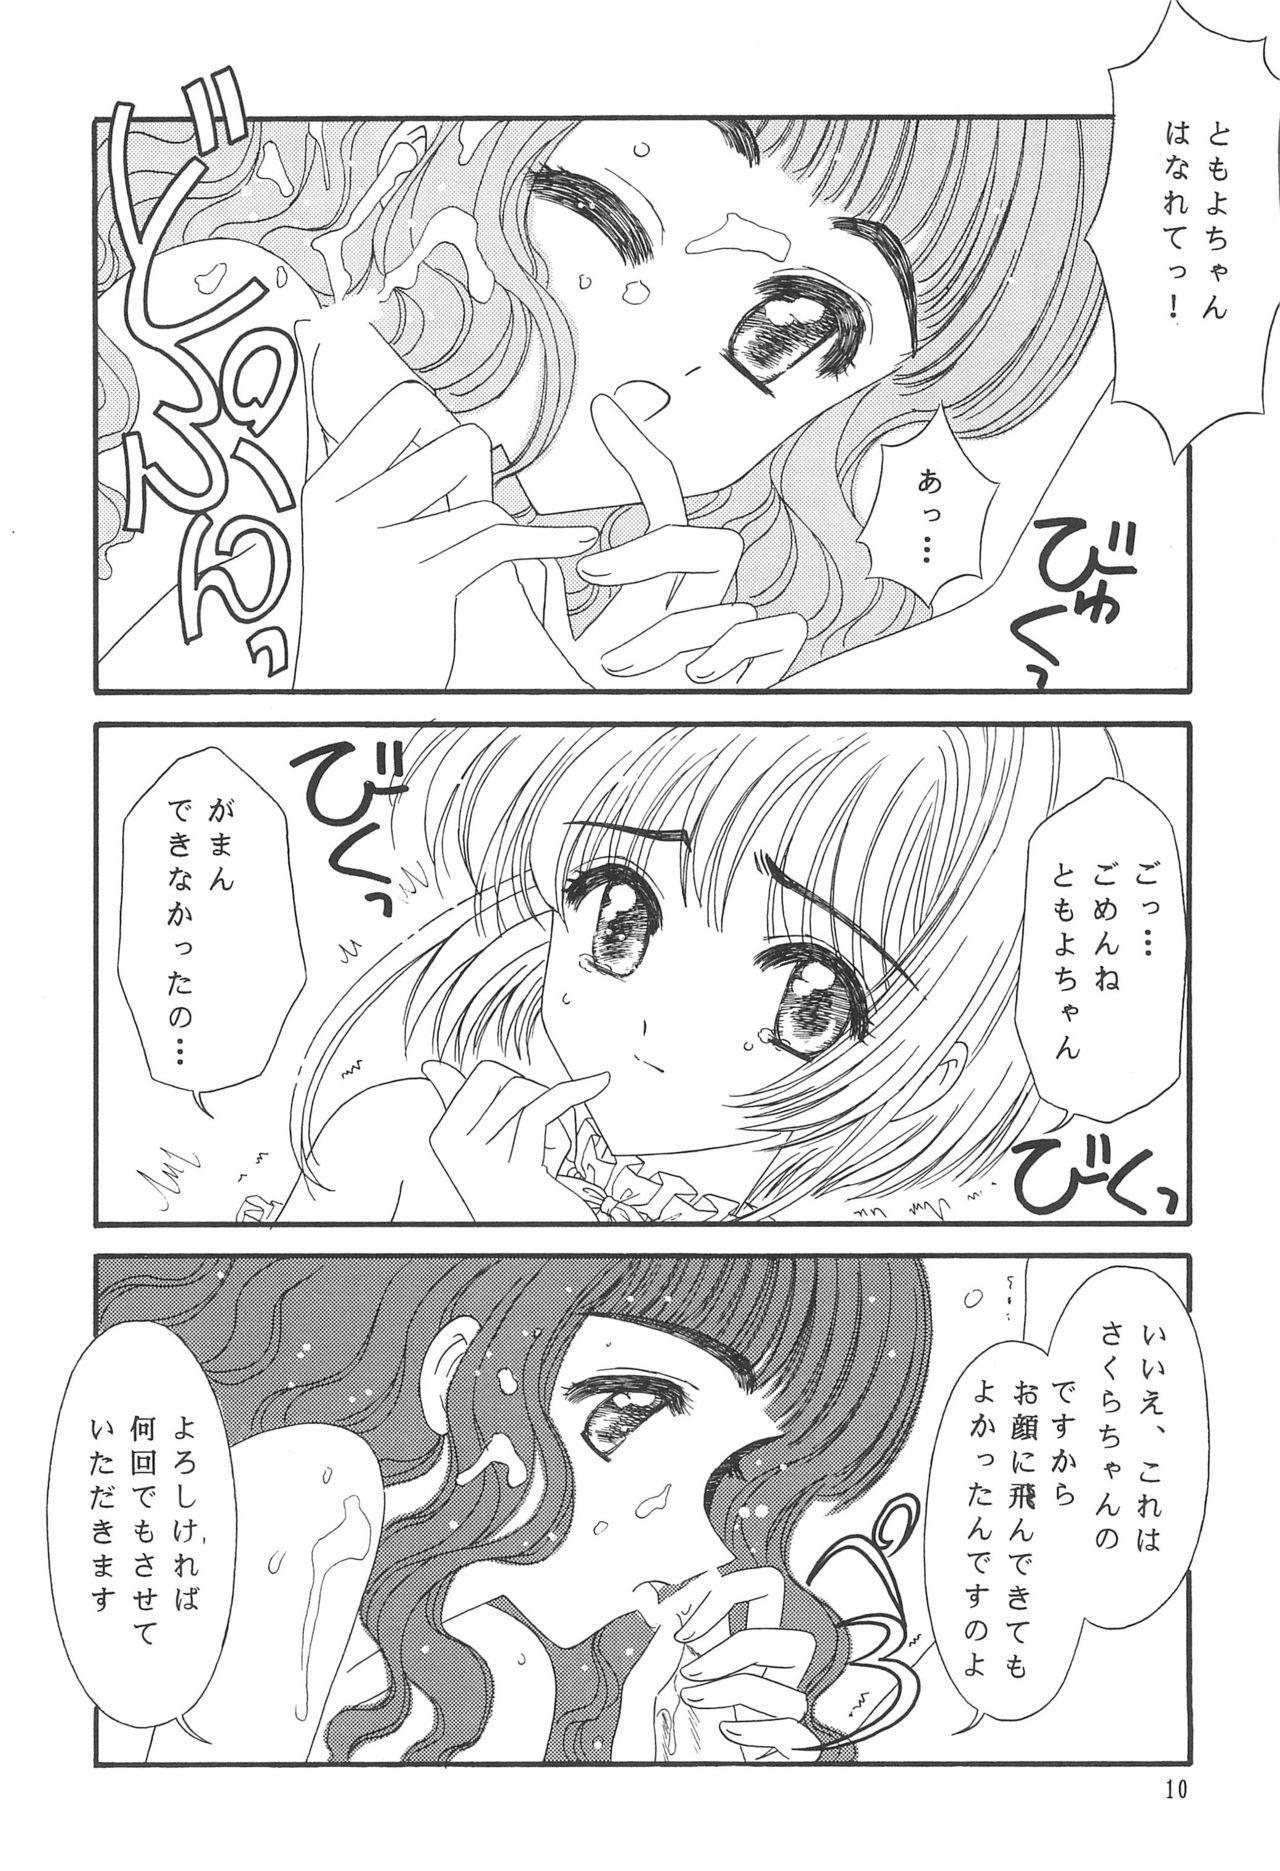 Showbaku 11